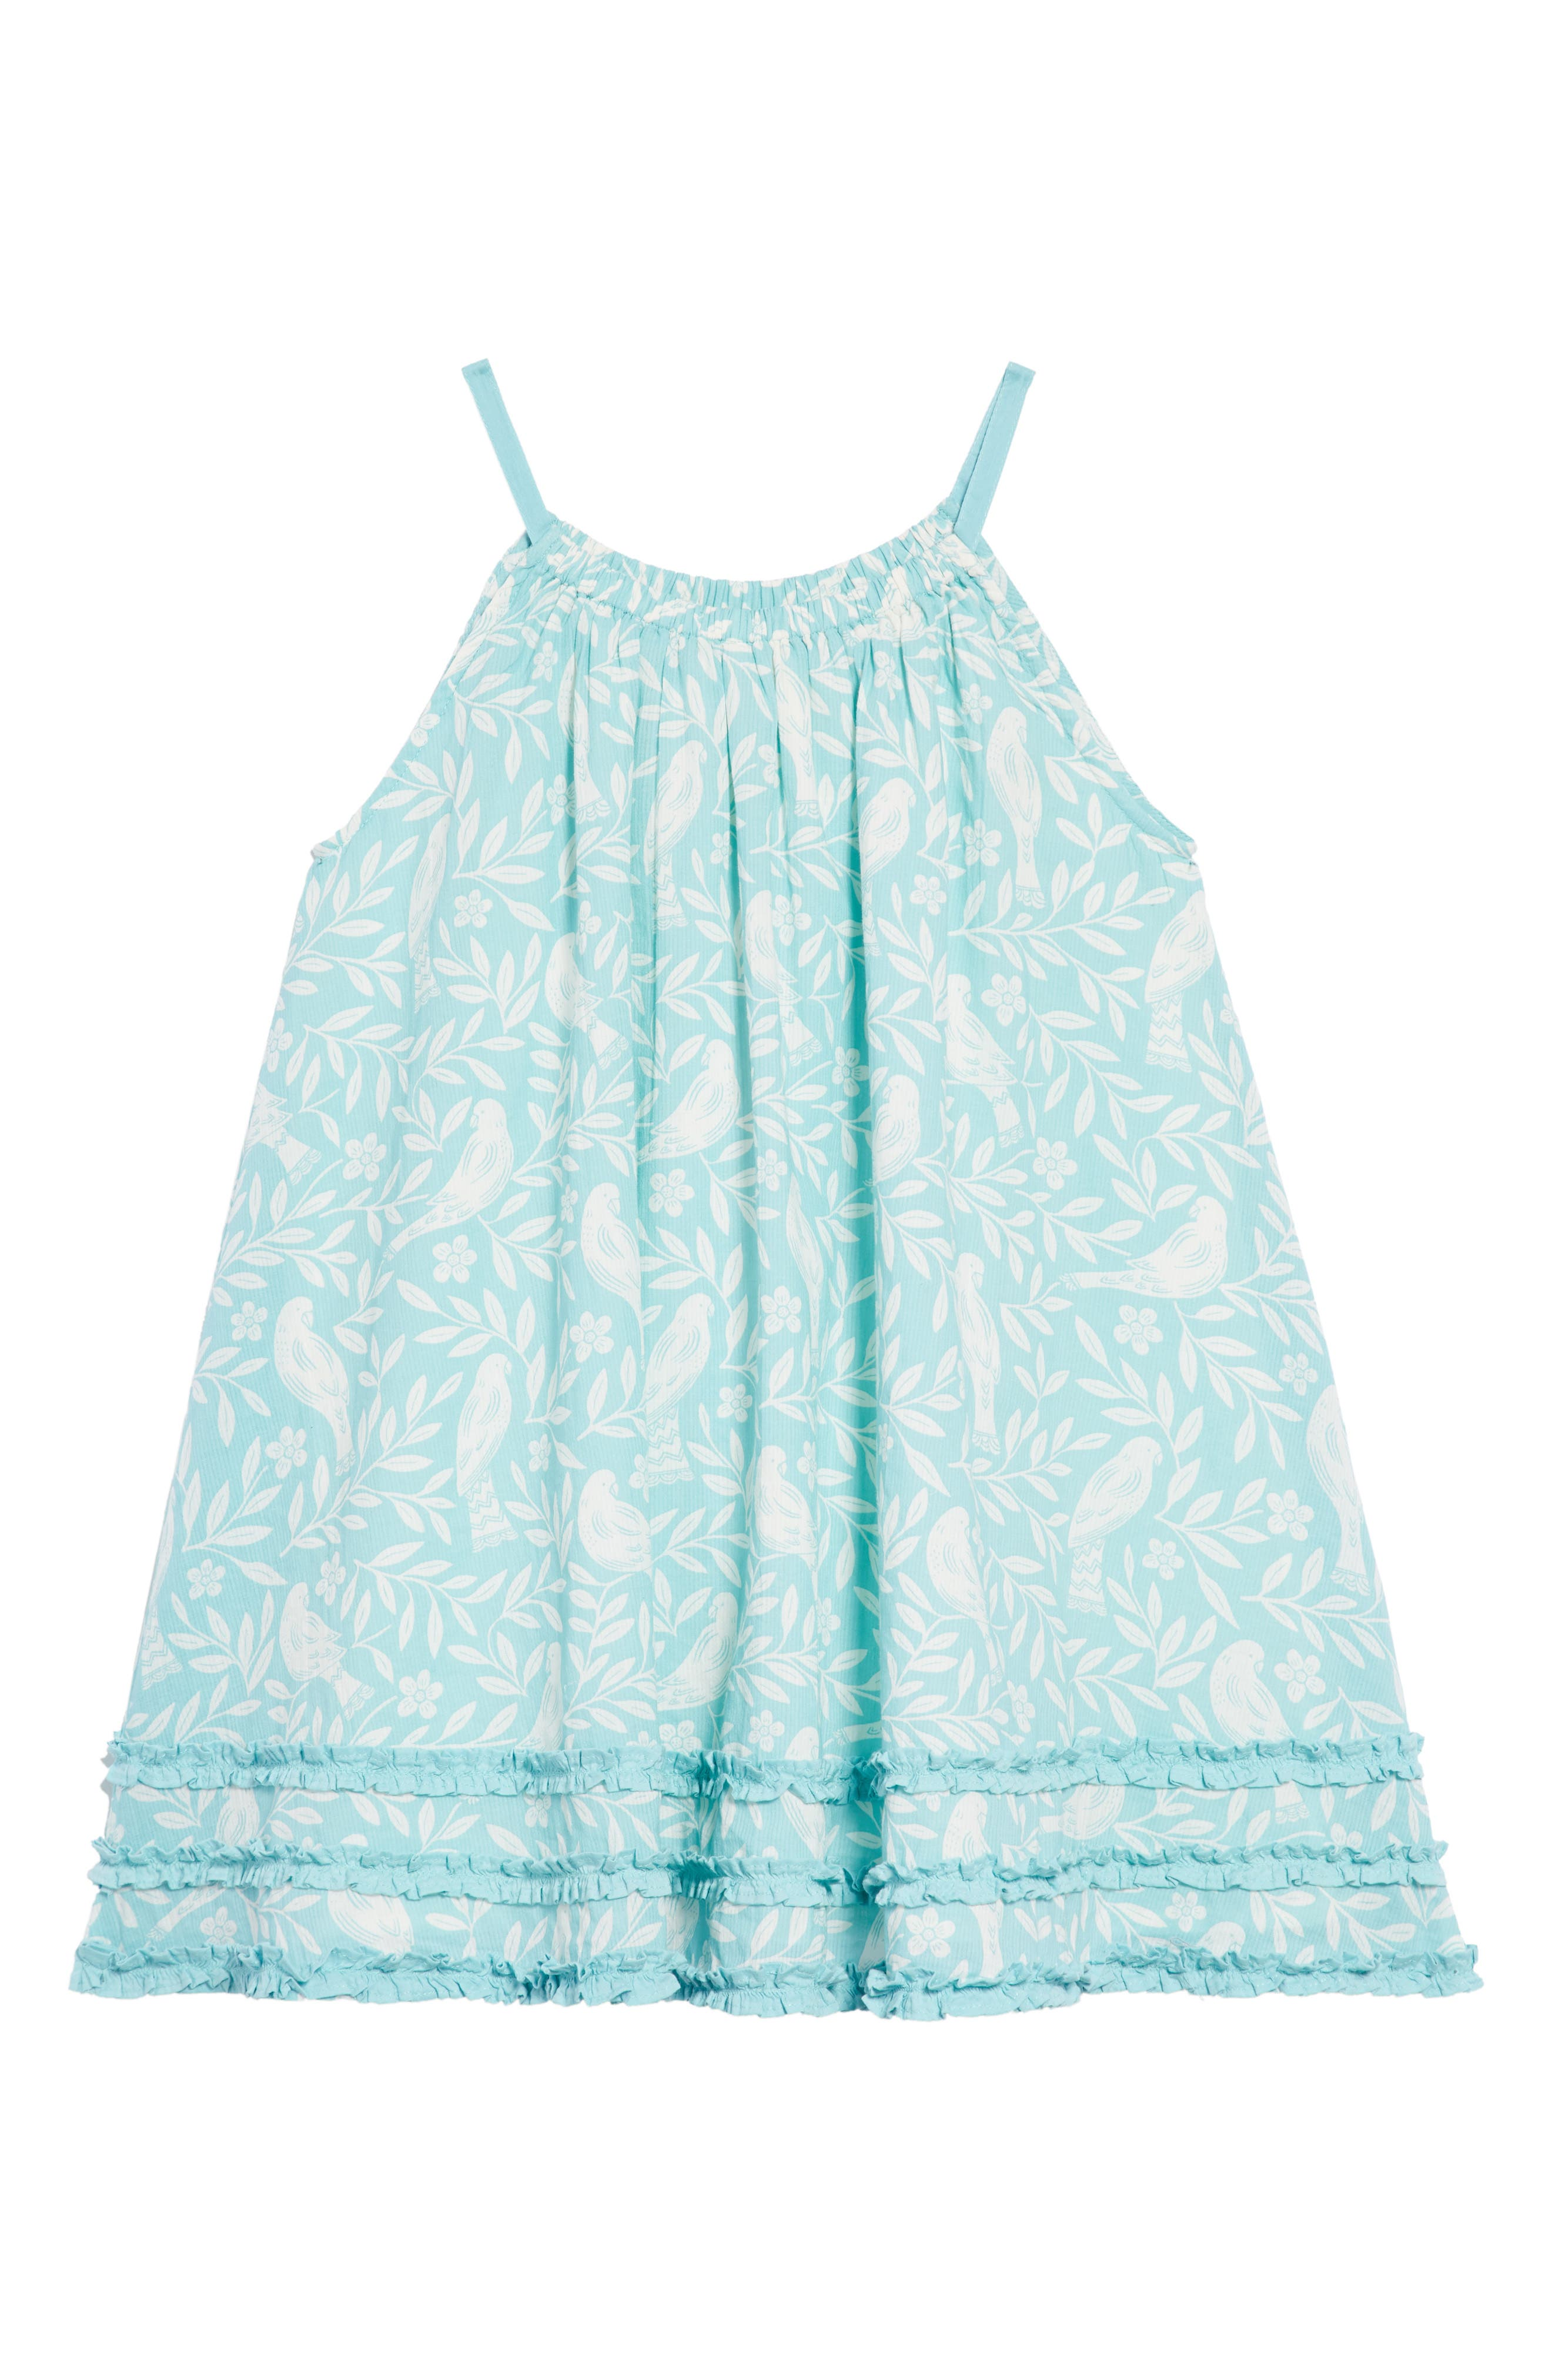 Vacation Woven Dress,                             Alternate thumbnail 3, color,                             Camper Blue Lino Bir